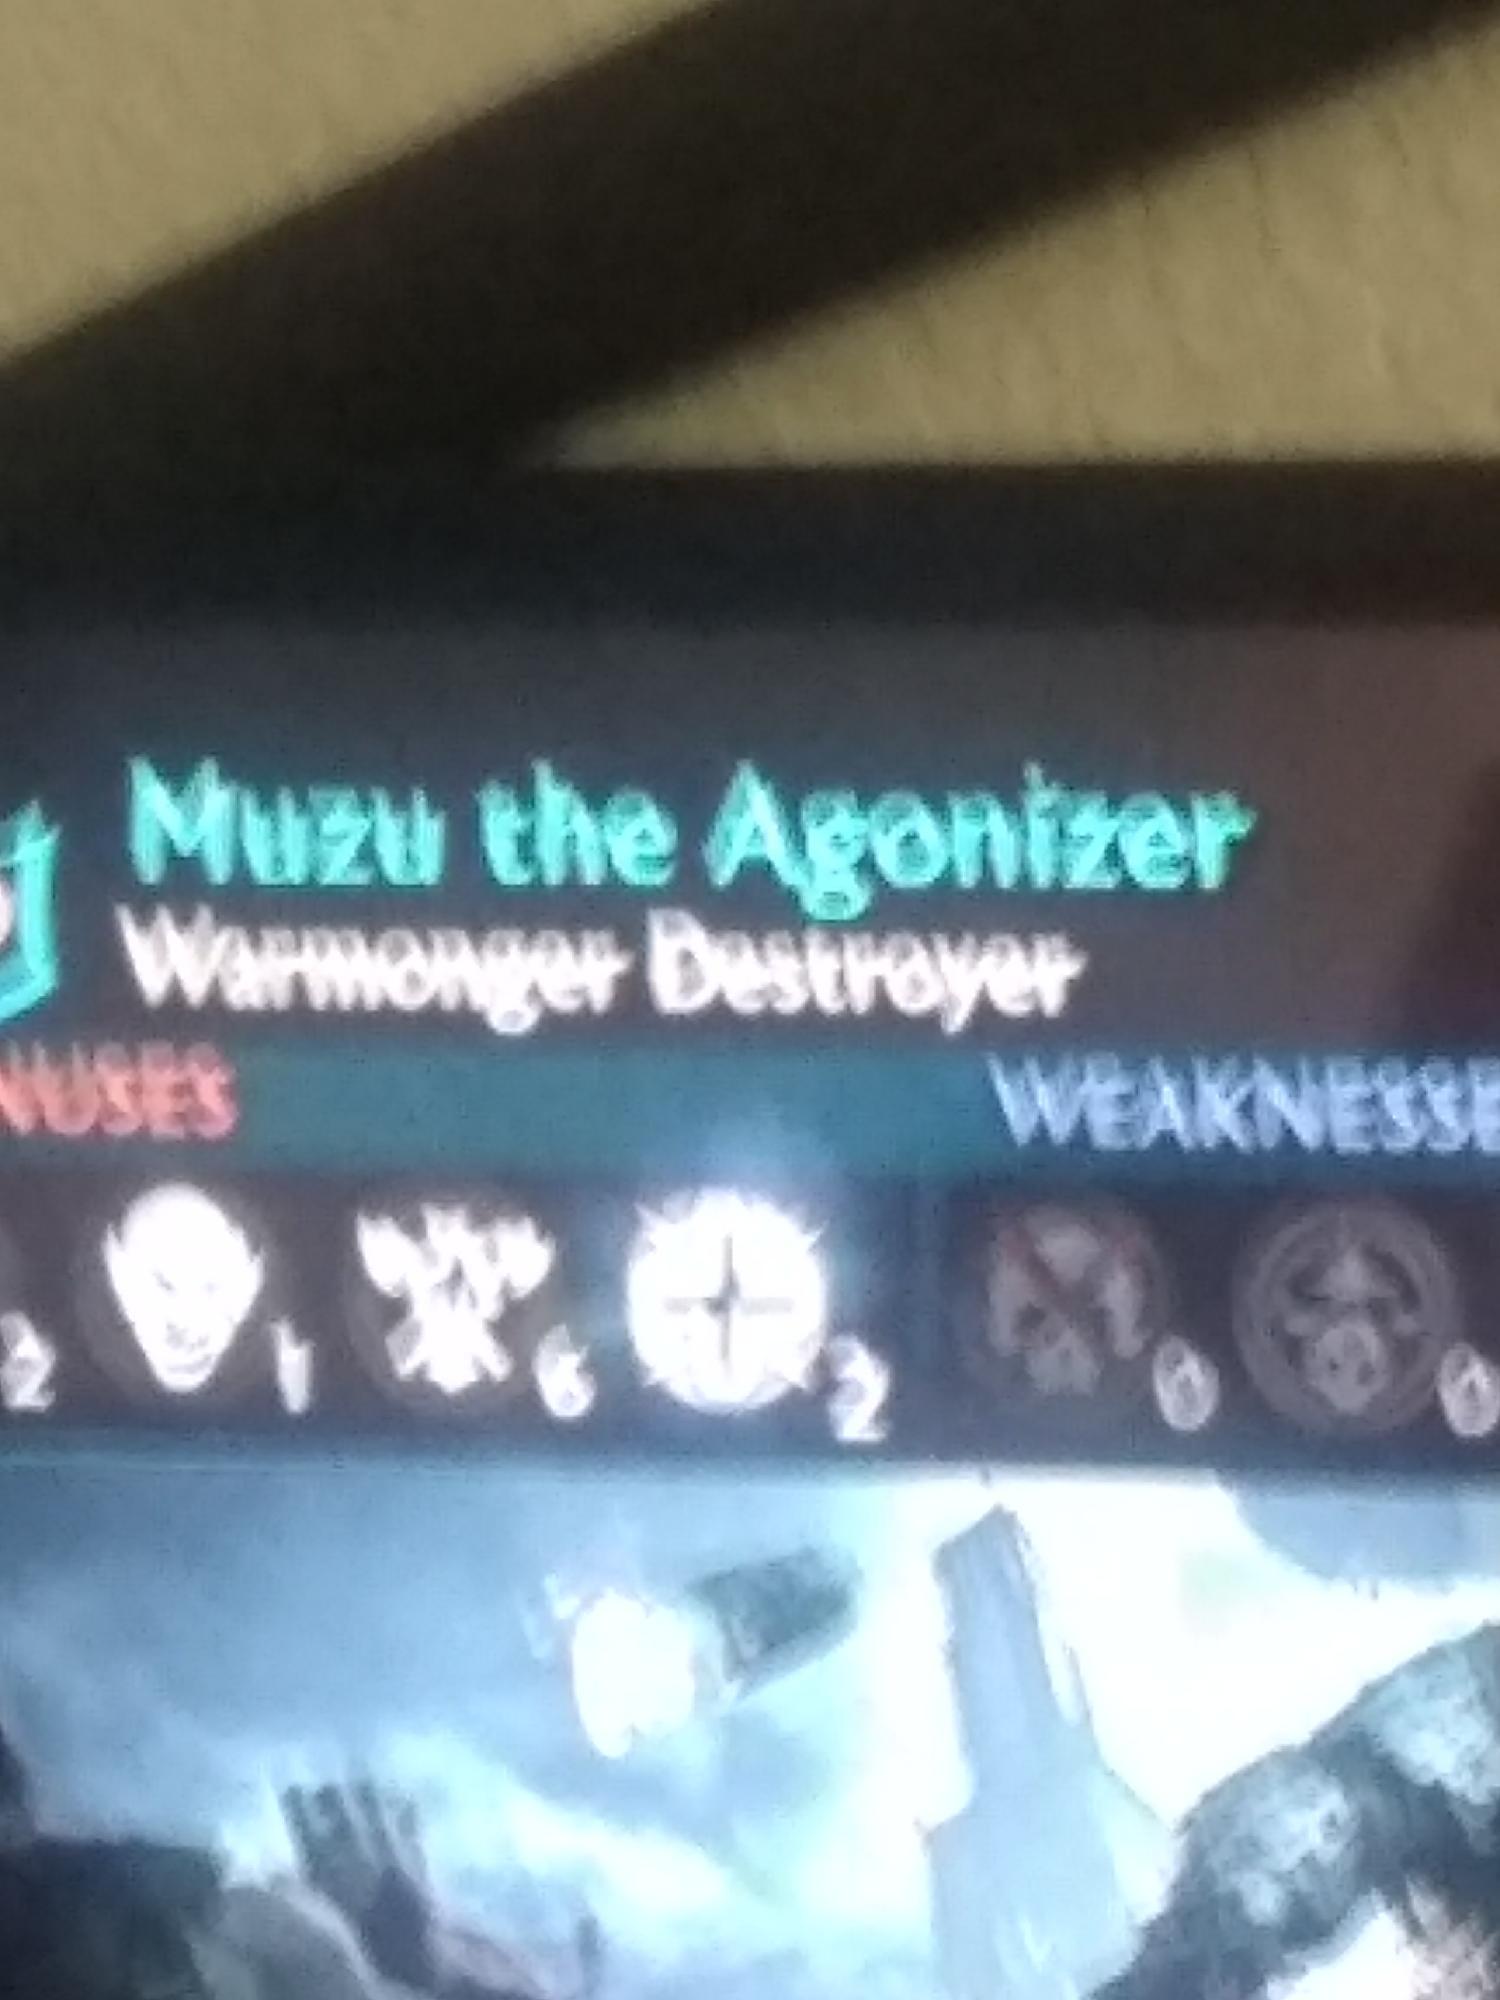 The Agonizer